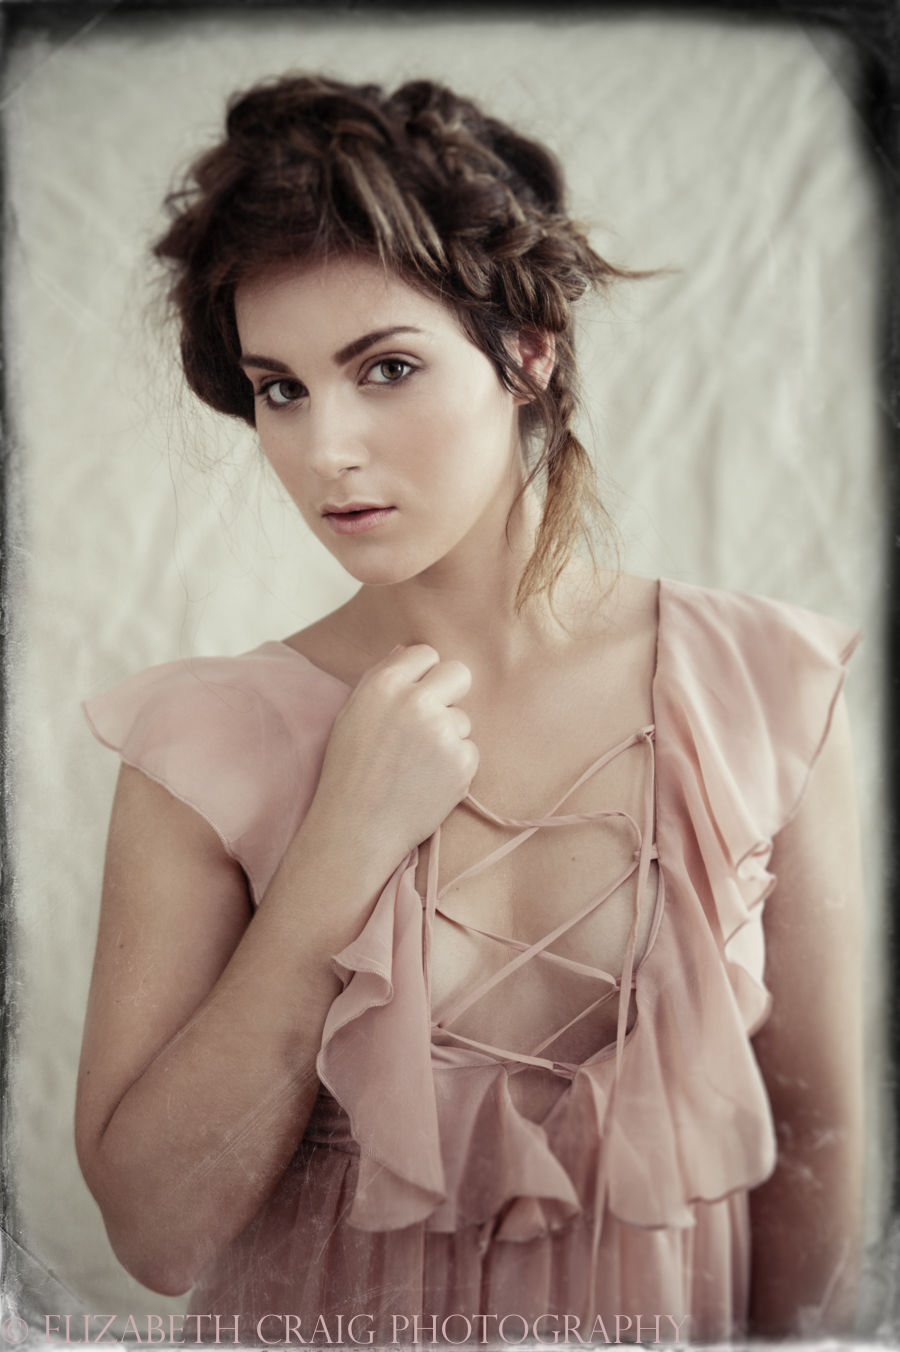 vintage-romantic-boudior-photography-elizabeth-craig-photography-060